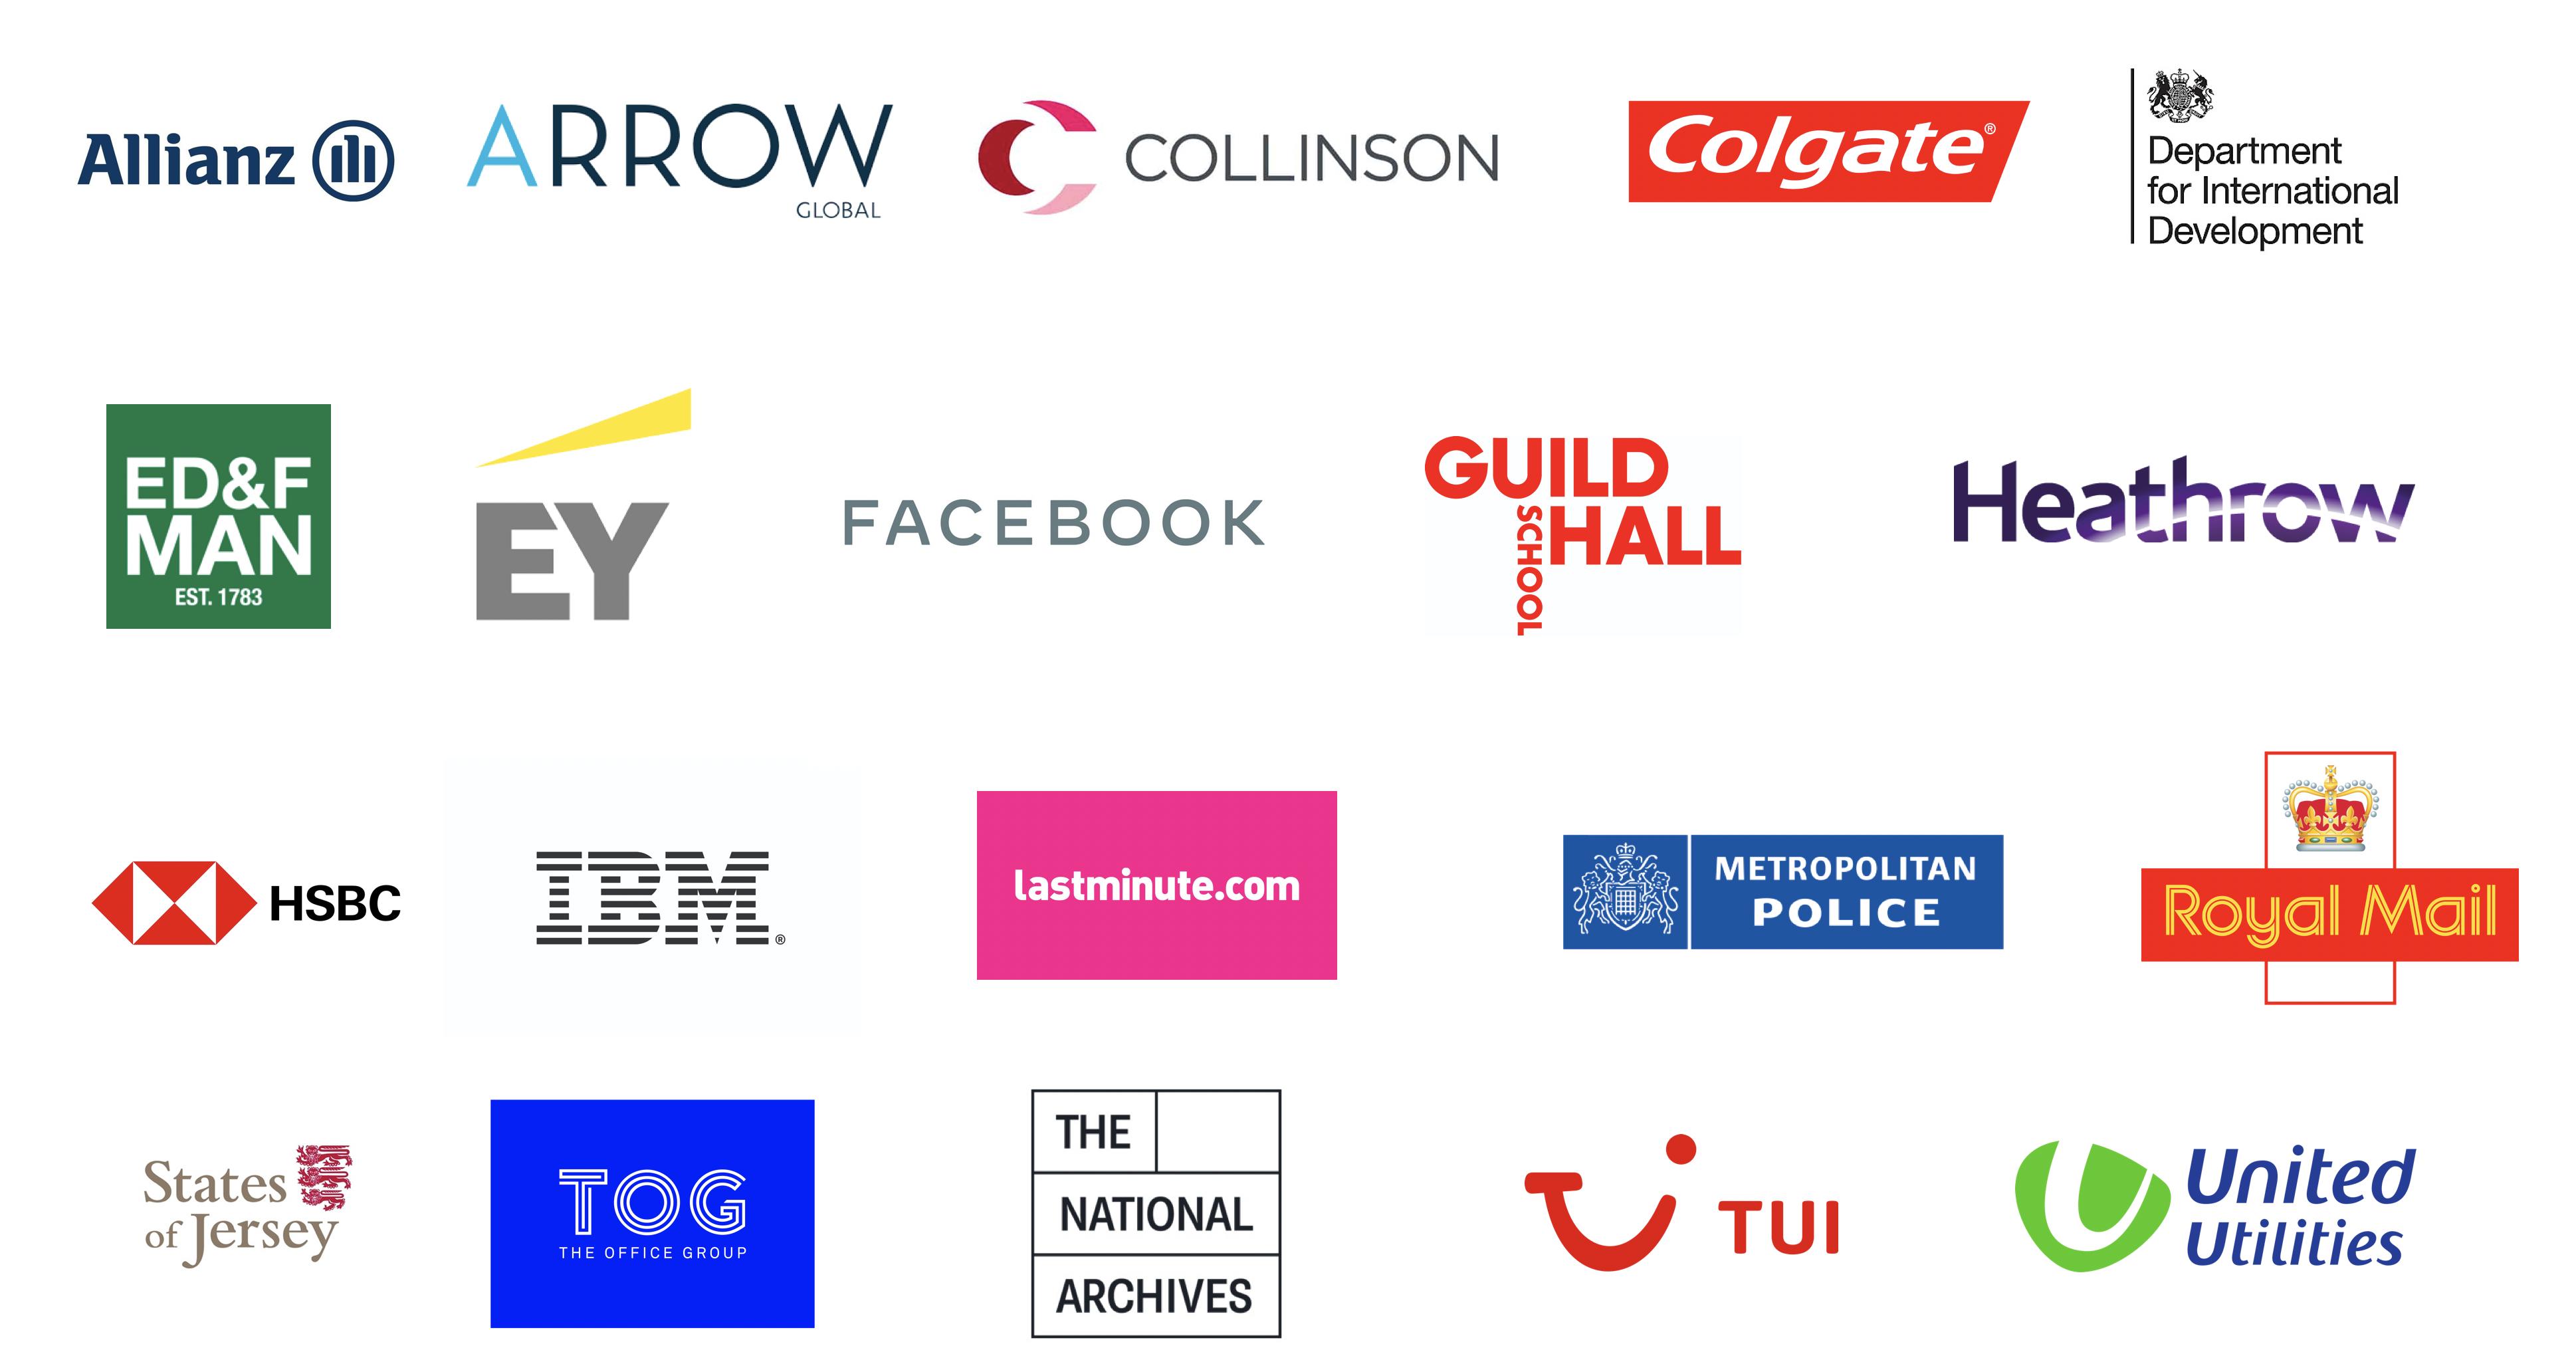 Generation Digital Clients - Arrow Global, Allianz, Collinson, Colgate, Department of International Development, ED&F Man, EY, Facebook, Heathrow, HSBC, IBM, Lastminute.com, Metropolitan Police, Royal Mail, Tui, United Utilities